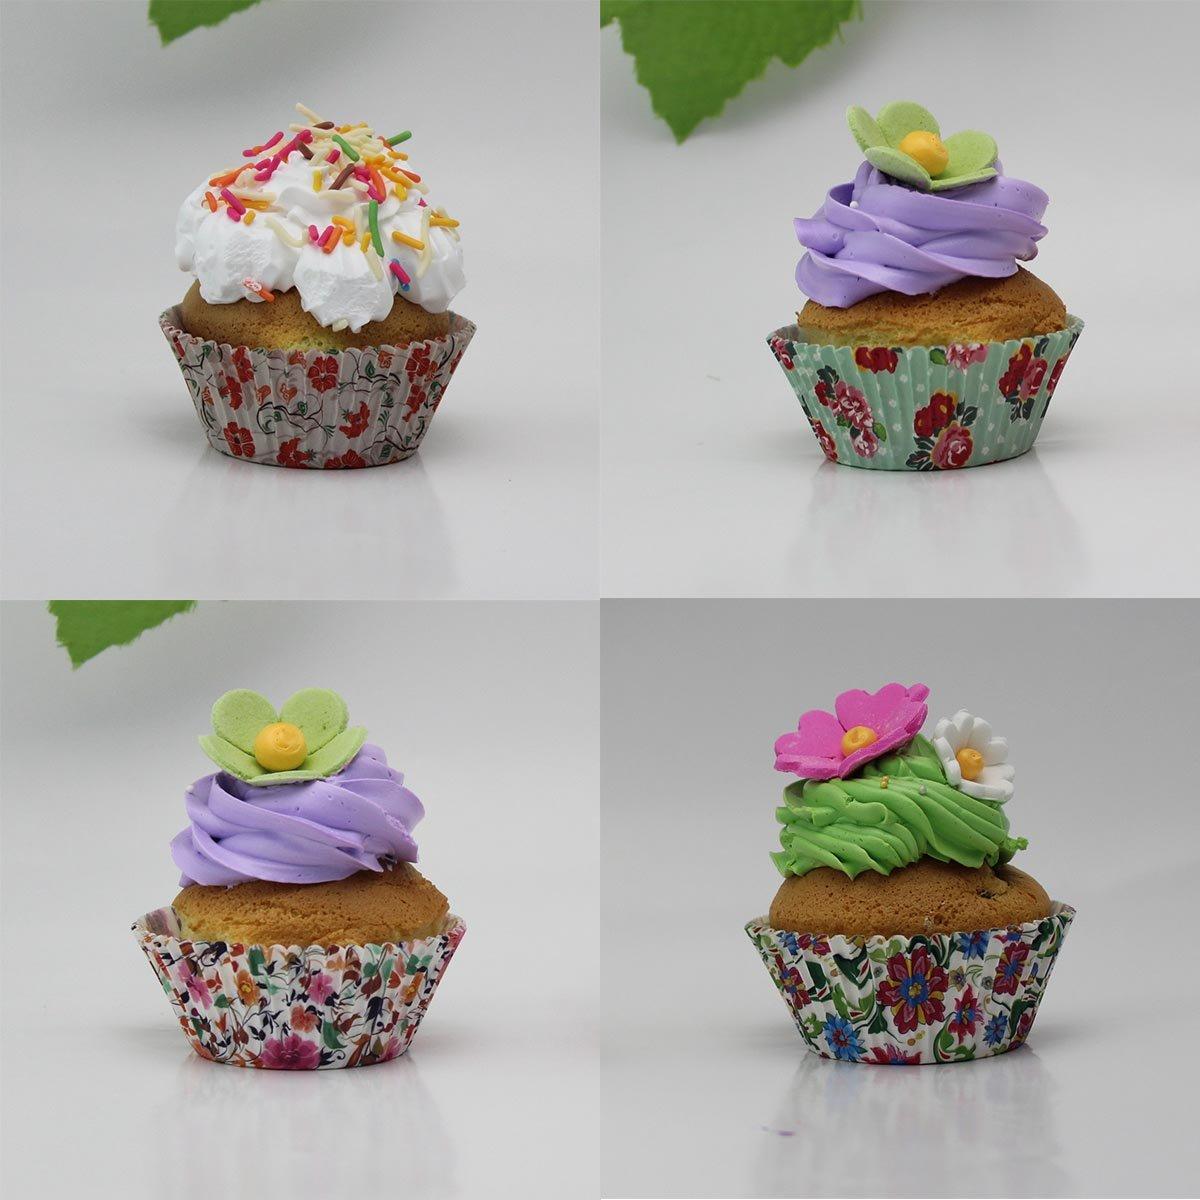 Amazon.com: SophieBella 8 kinds Flower Muffin Liner Cupcake-Liner ...